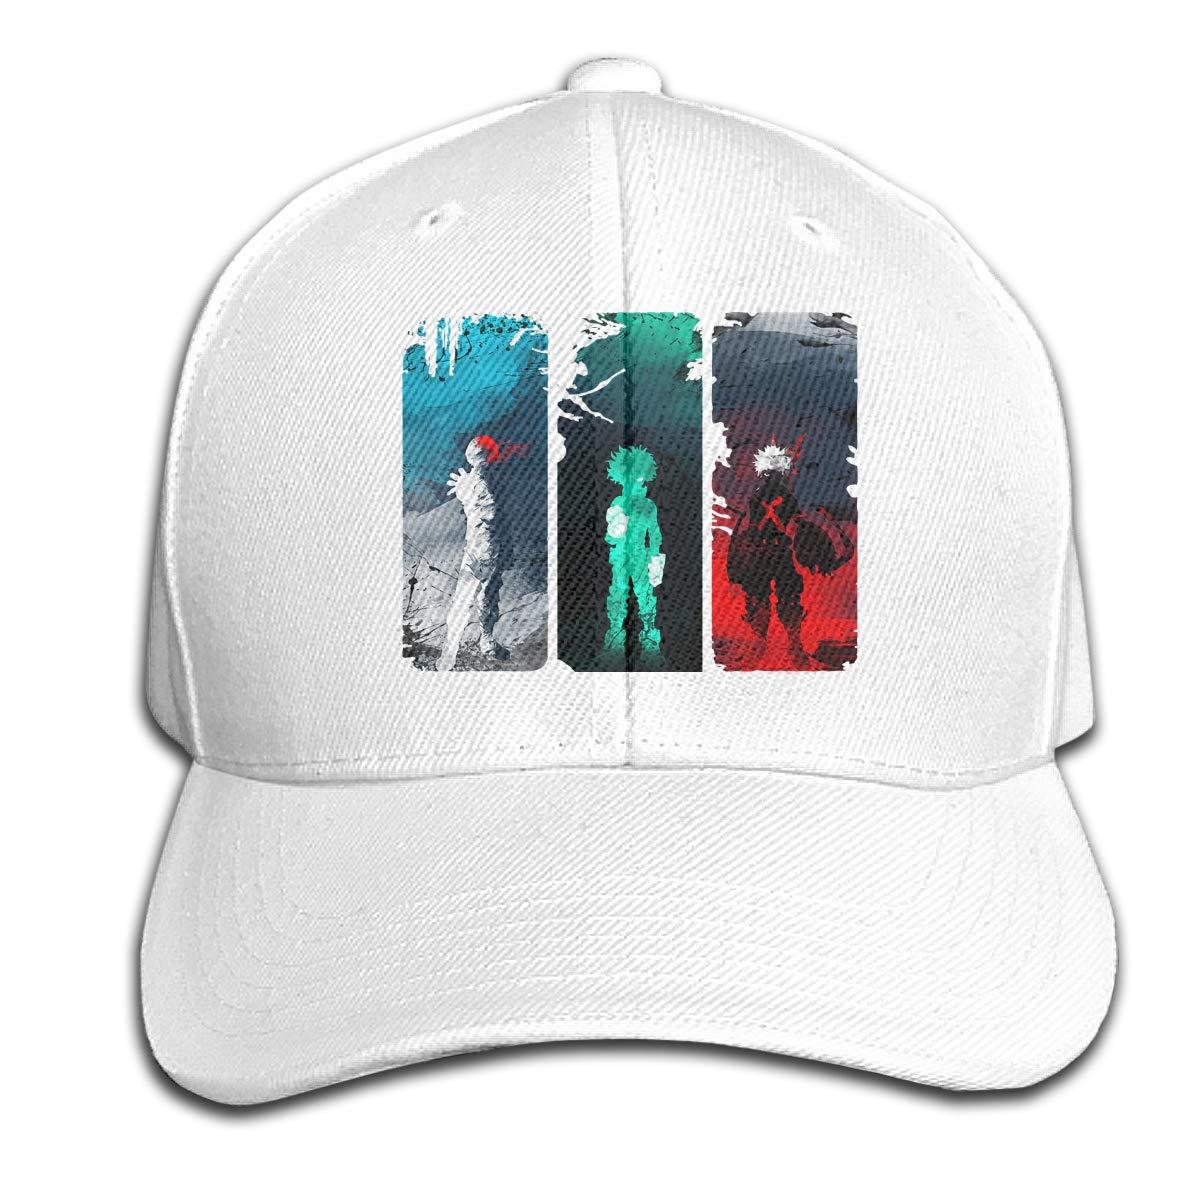 WoodWorths My Hero Academia Adjustable Basketball Cap Peaked Hat Mens Women Leisure Unisex